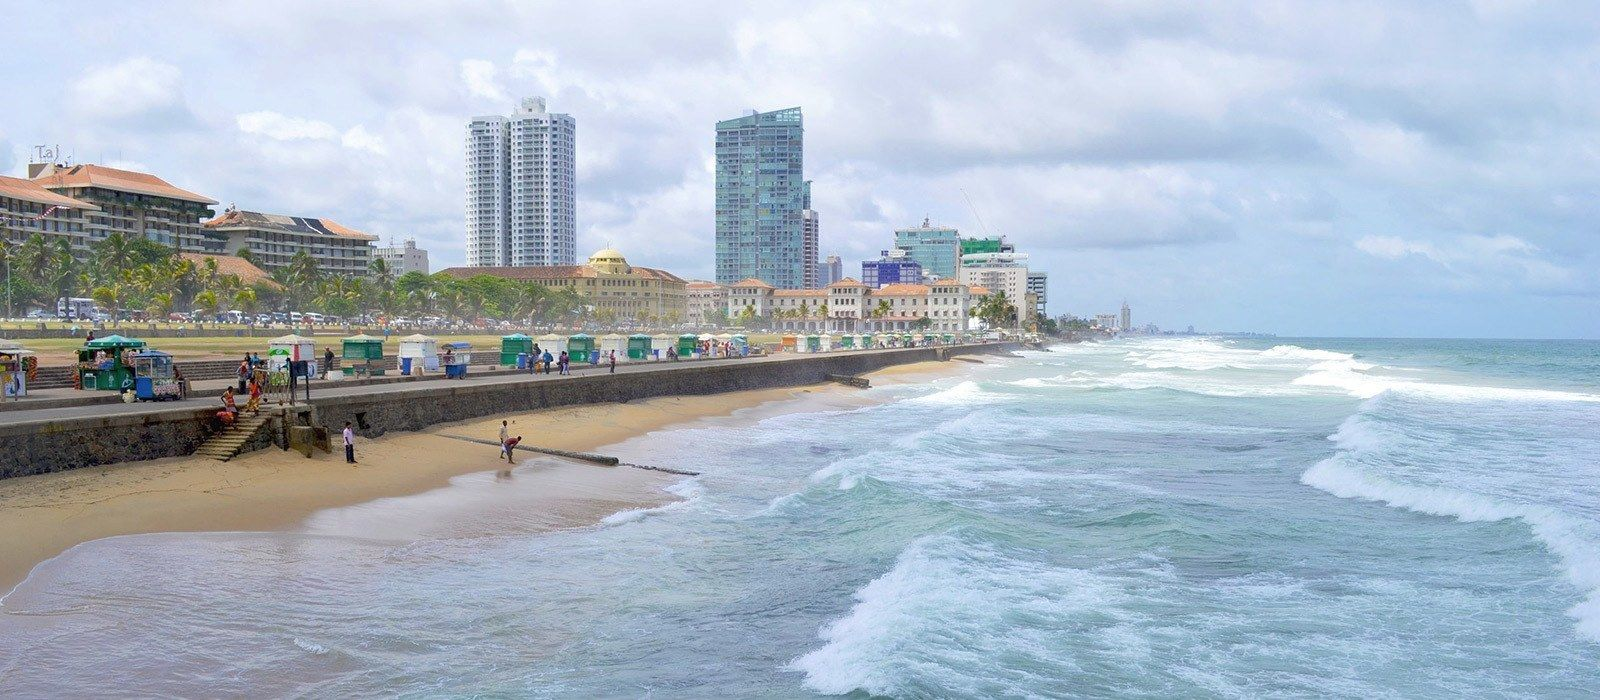 Ancient Wonders & Beaches of Sri Lanka Tour Trip 5